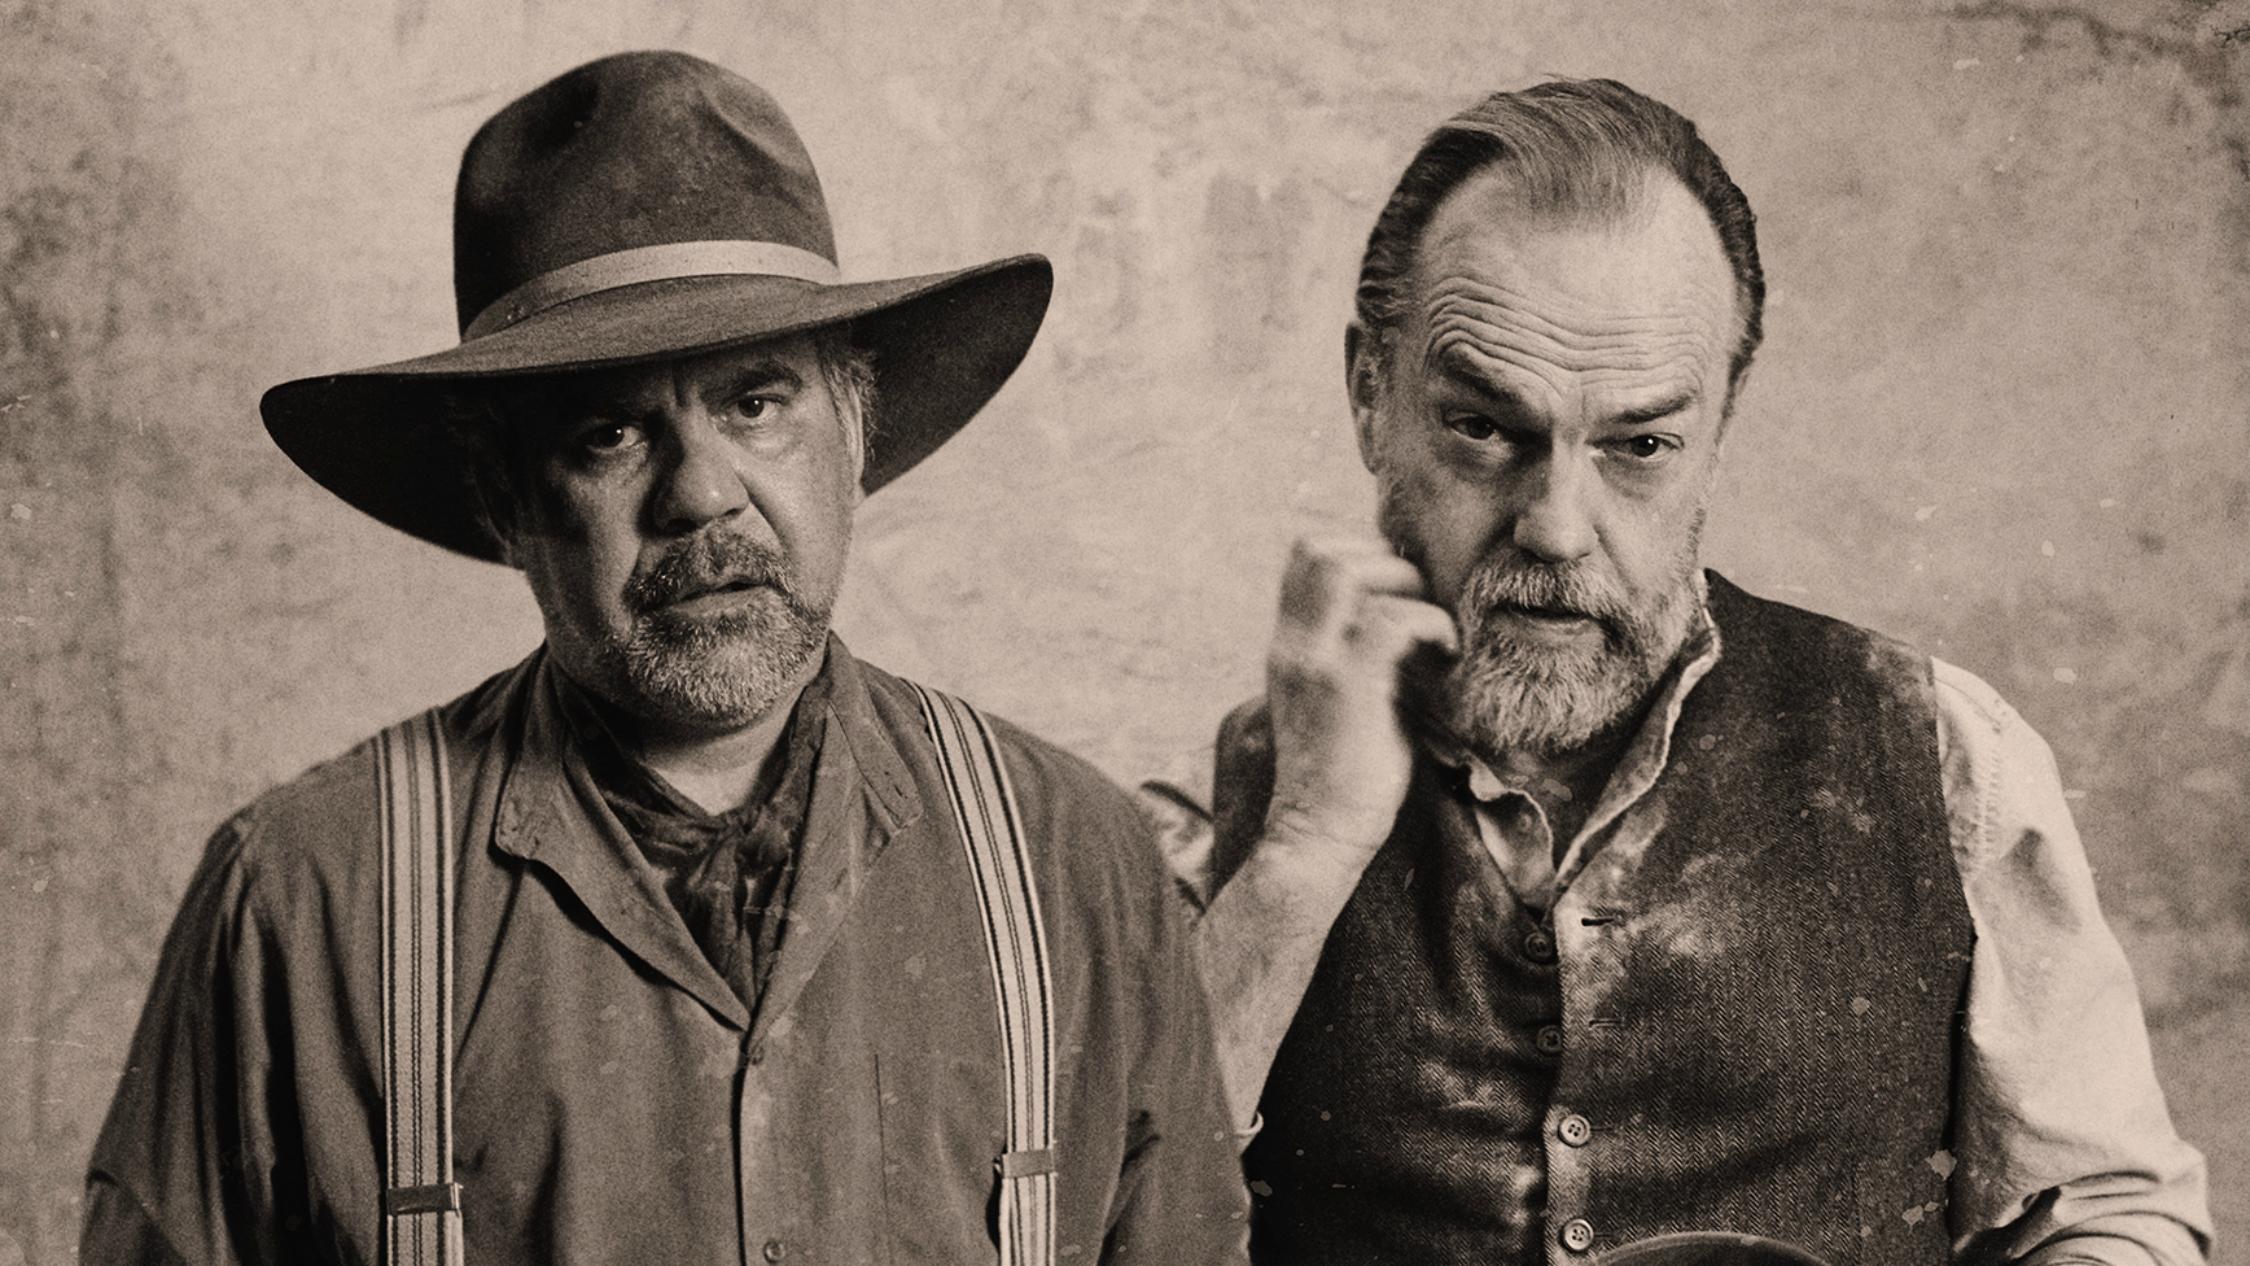 Wayne Blair and Hugo Weaving in costume in Angus Cerini's Wonnangatta